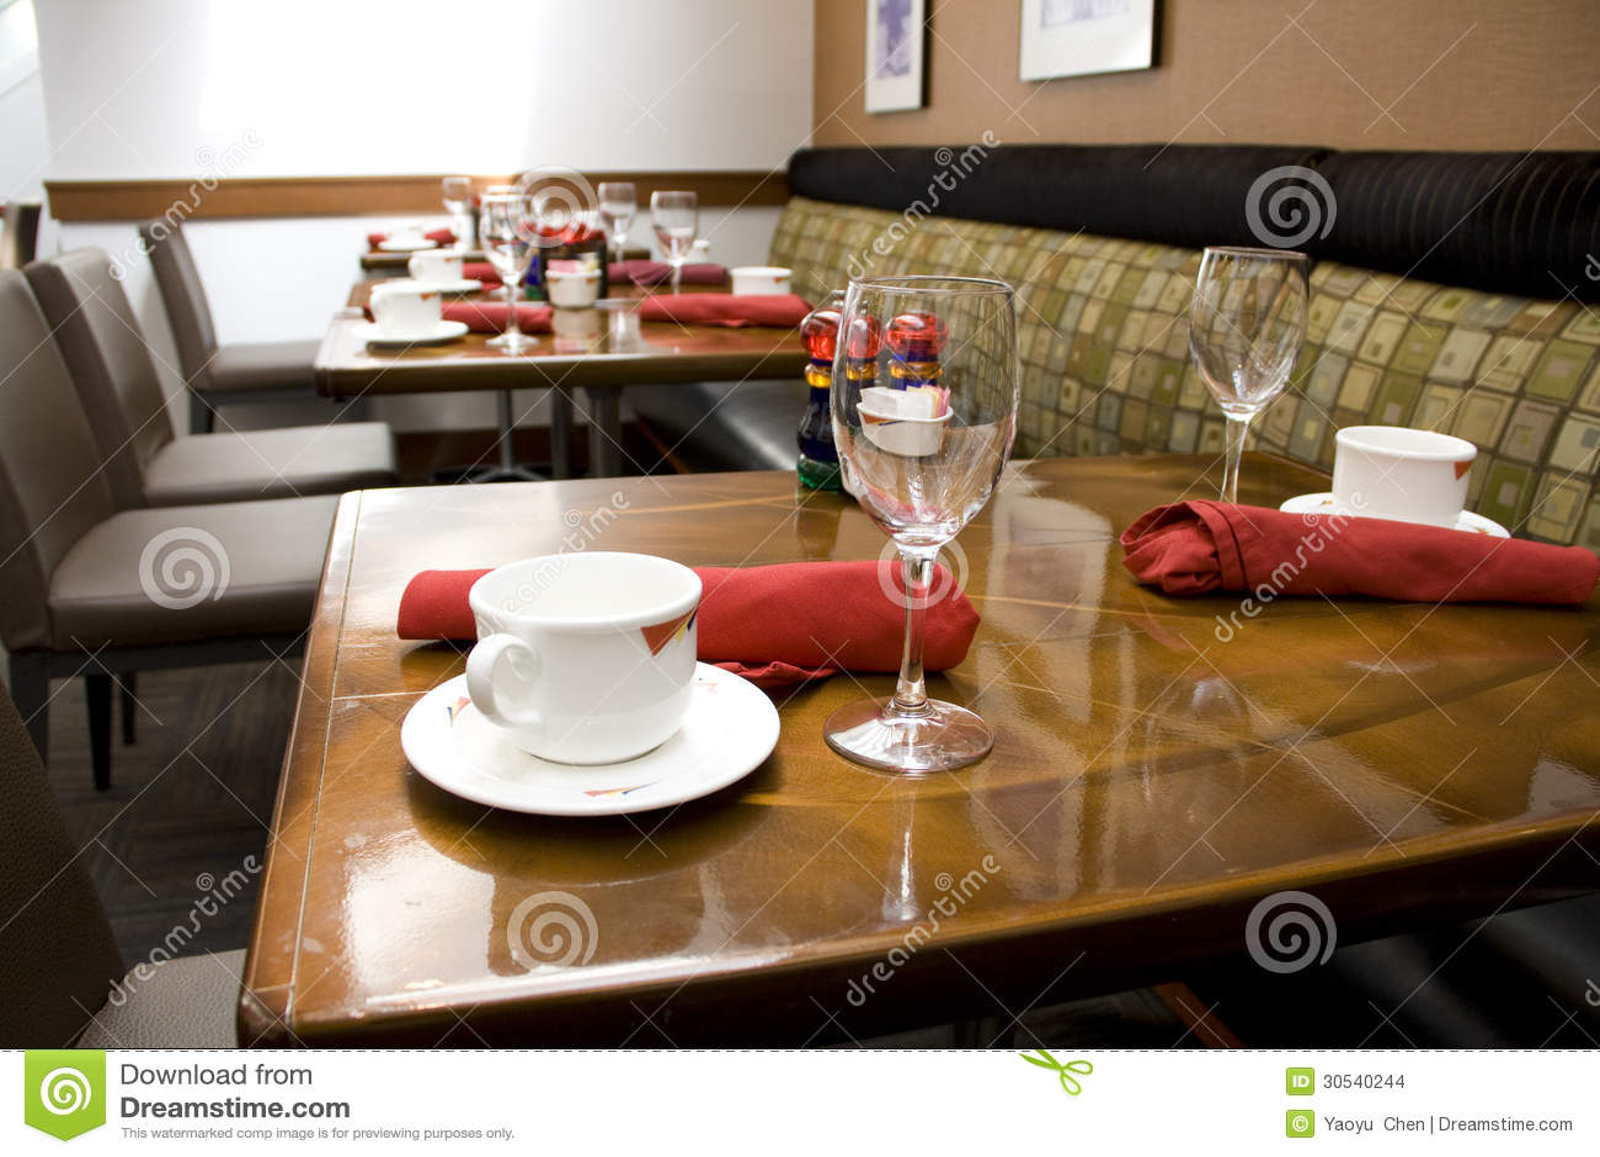 Fancy restaurant table setting - Hotel Luxury Nice Restaurant Table